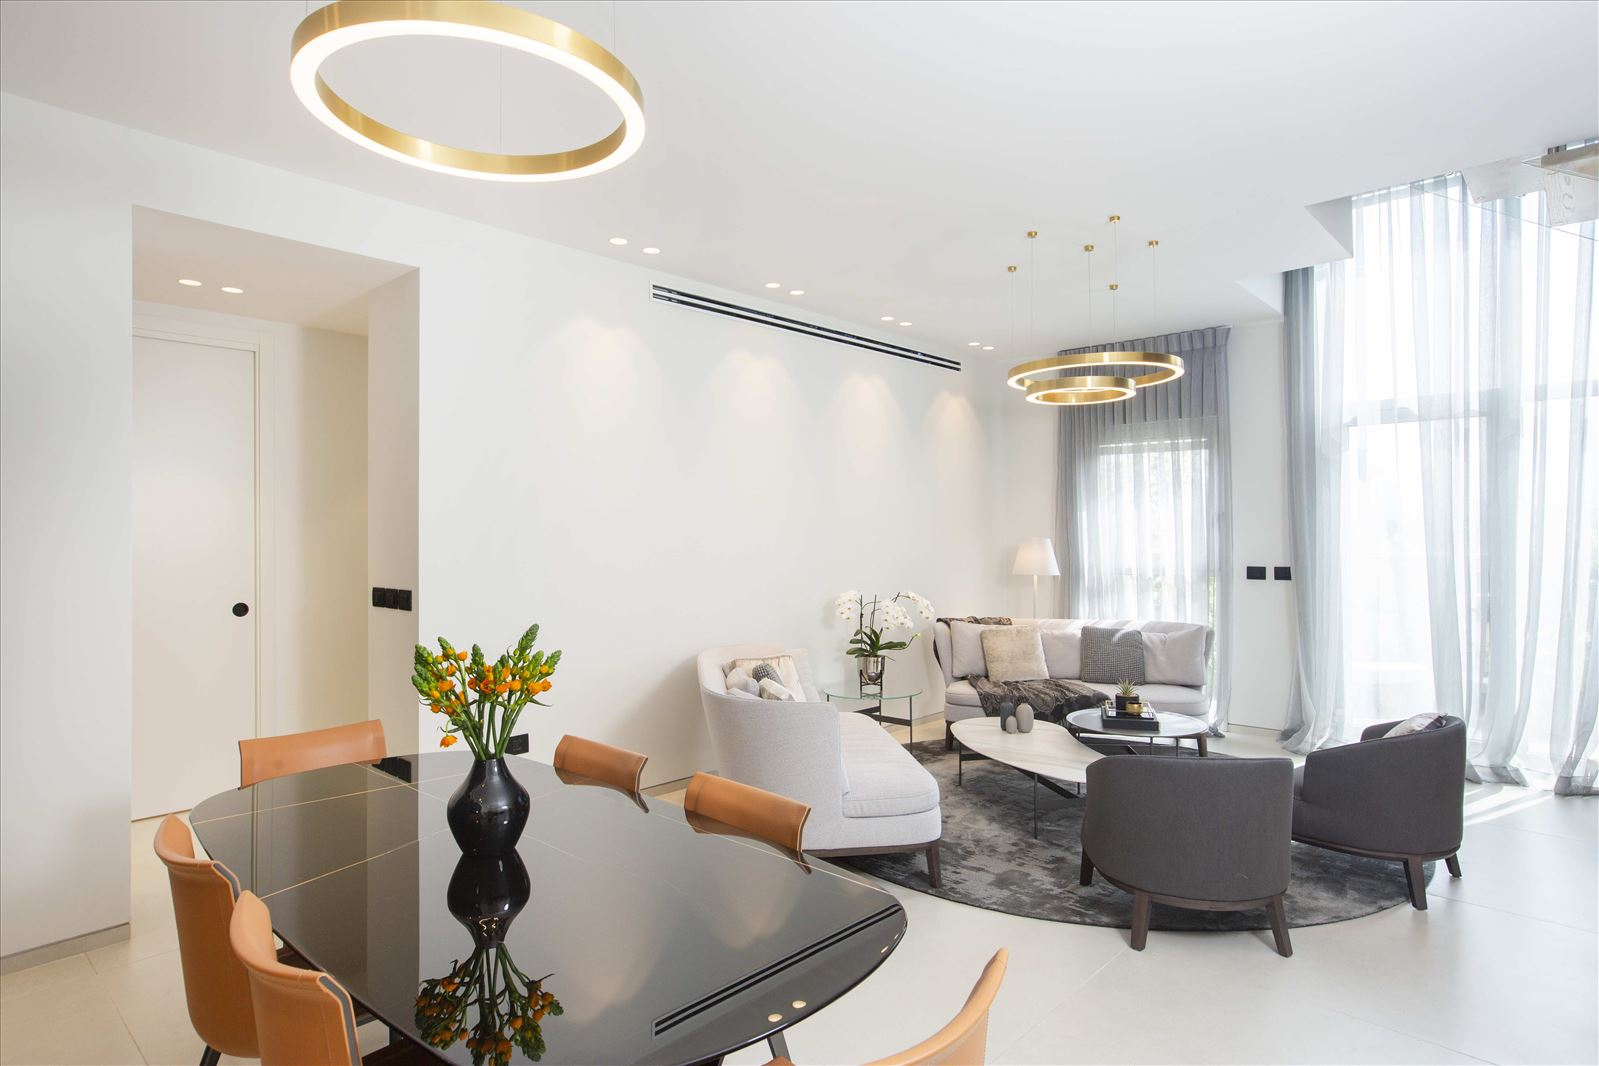 Tel Aviv apartment in Parisian aroma תאורה בסלון על ידי קמחי דורי